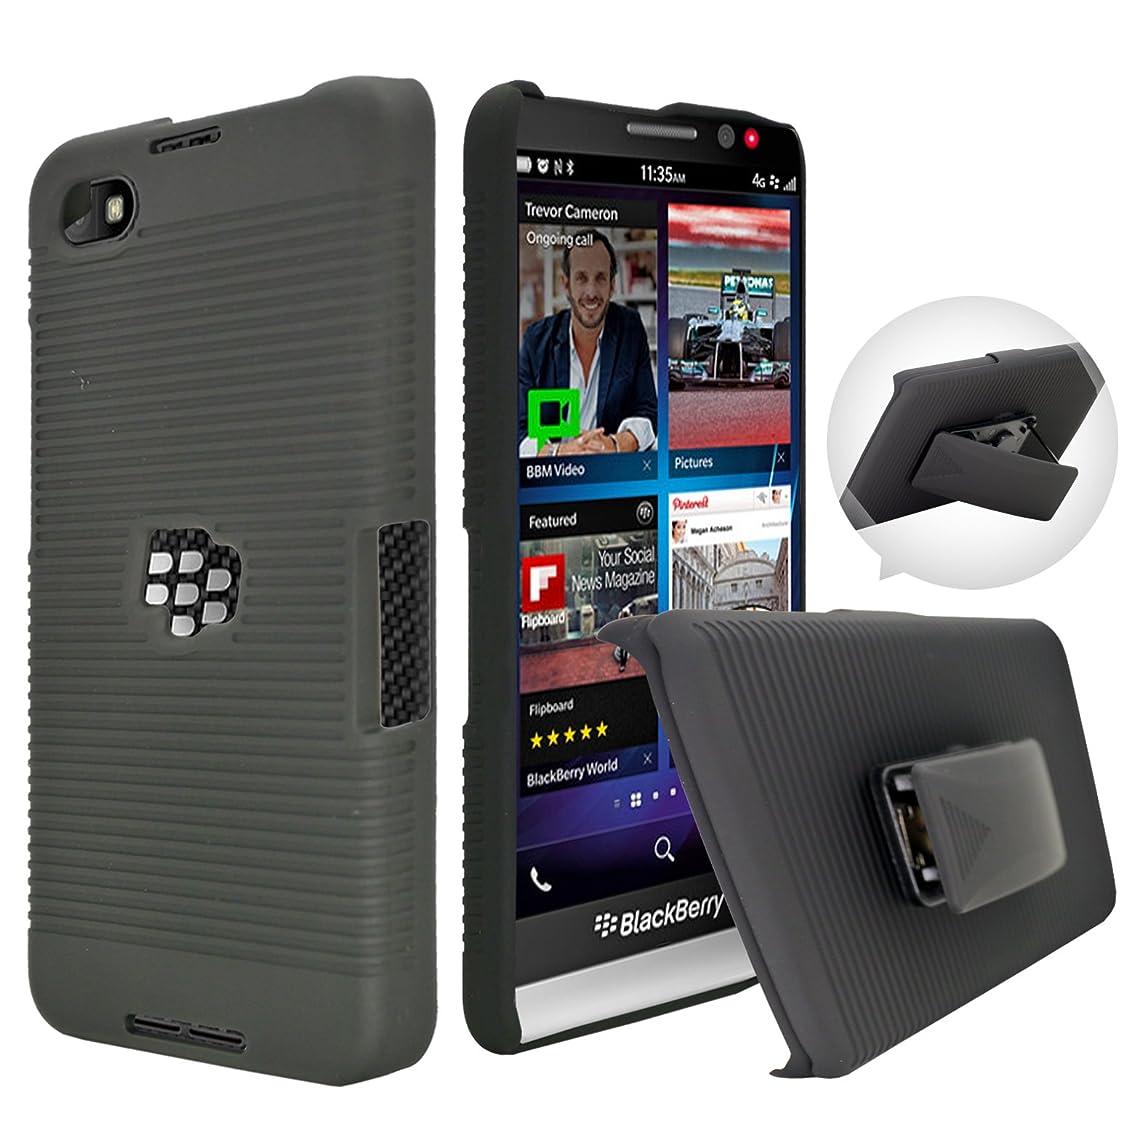 Black Rubberized Hard Case, Customerfirst Belt Clip Holster Stand For Blackberry Z30 Phone (Simply Black)